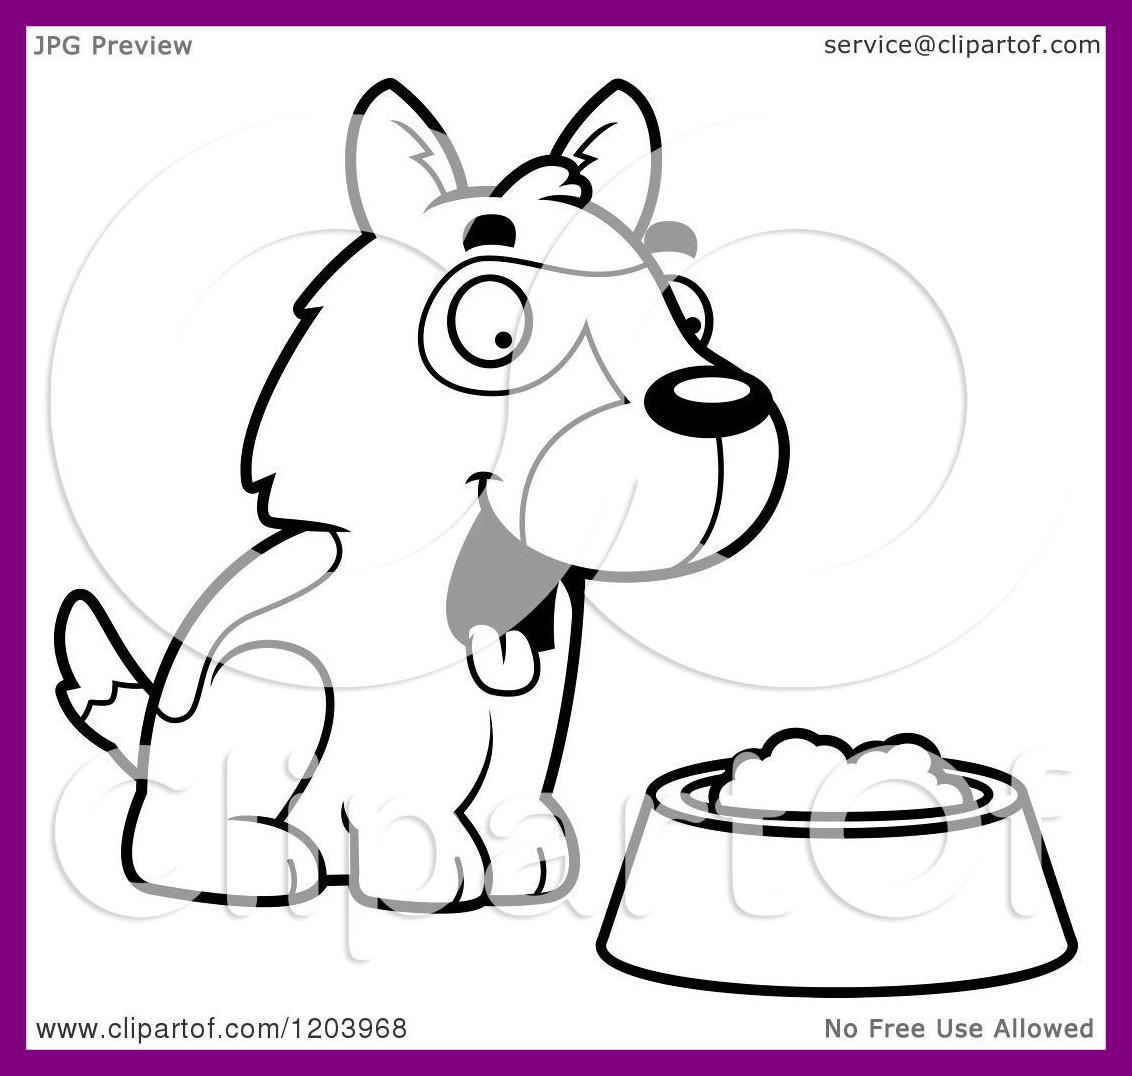 1132x1076 Shocking Cartoon Of A Black And White Cute Bulldog Puppy Dog